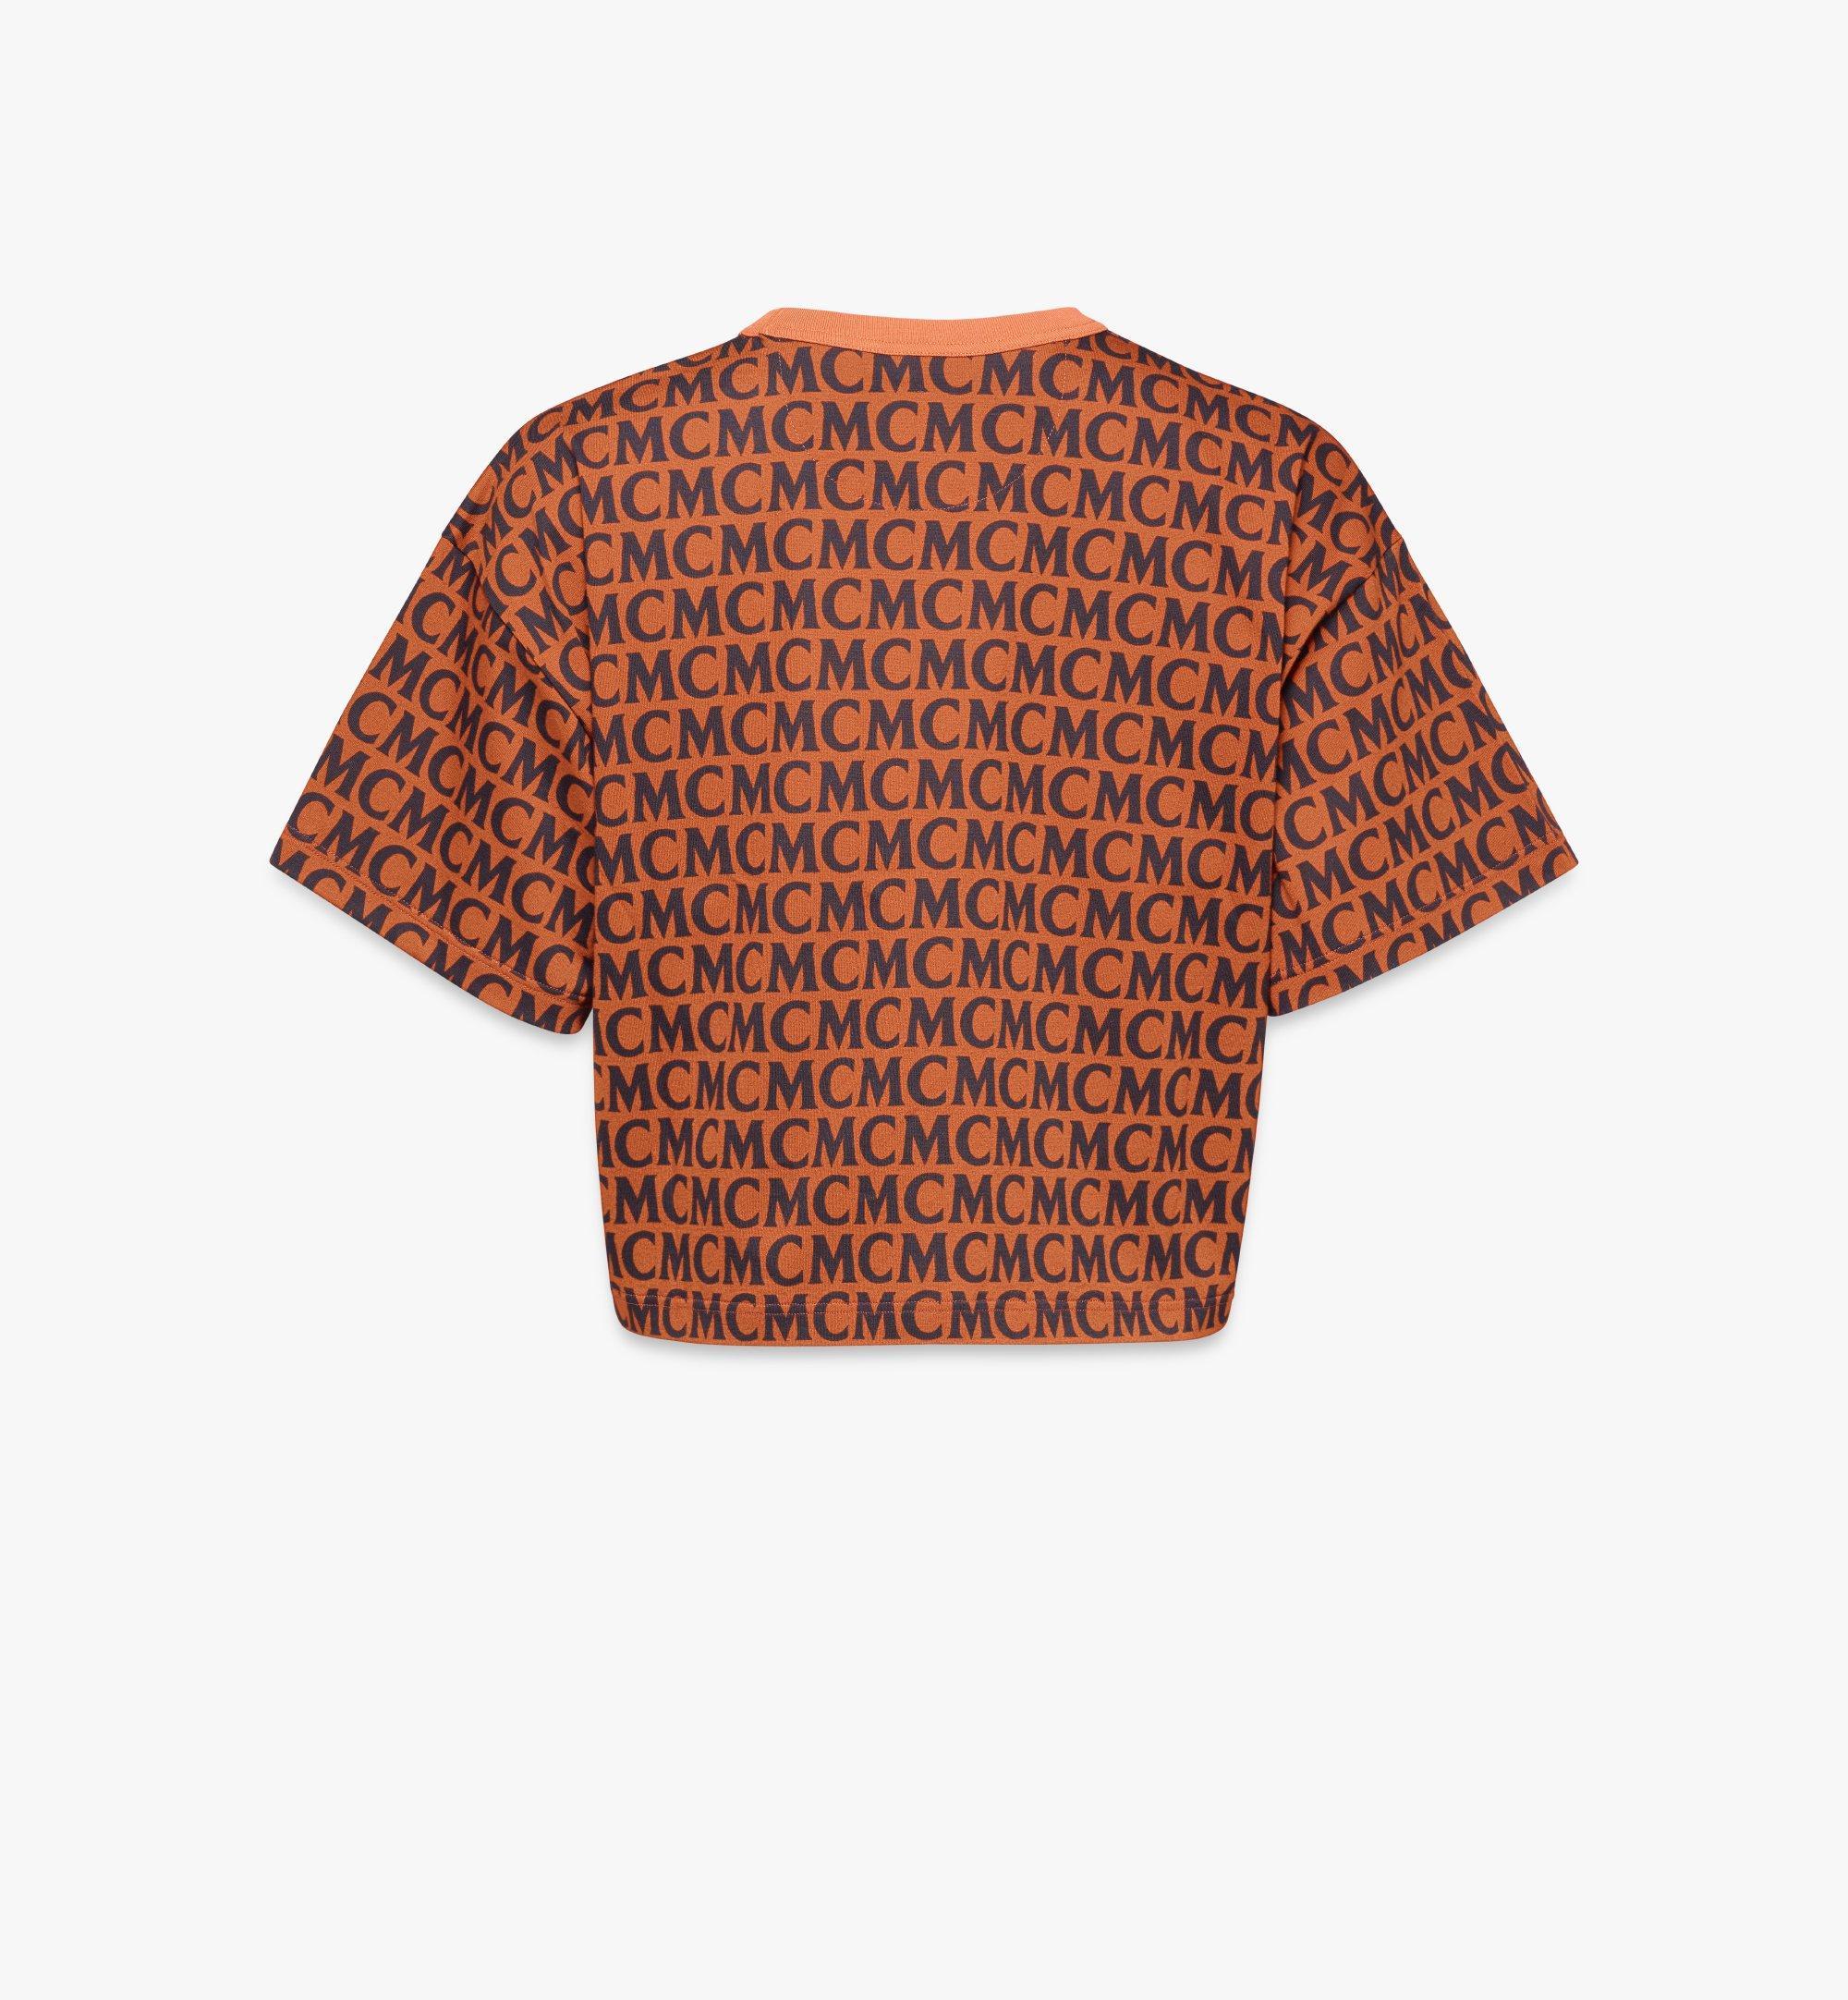 MCM T-shirt monogrammé pour femme Black MFTAAMD01C400L Alternate View 2